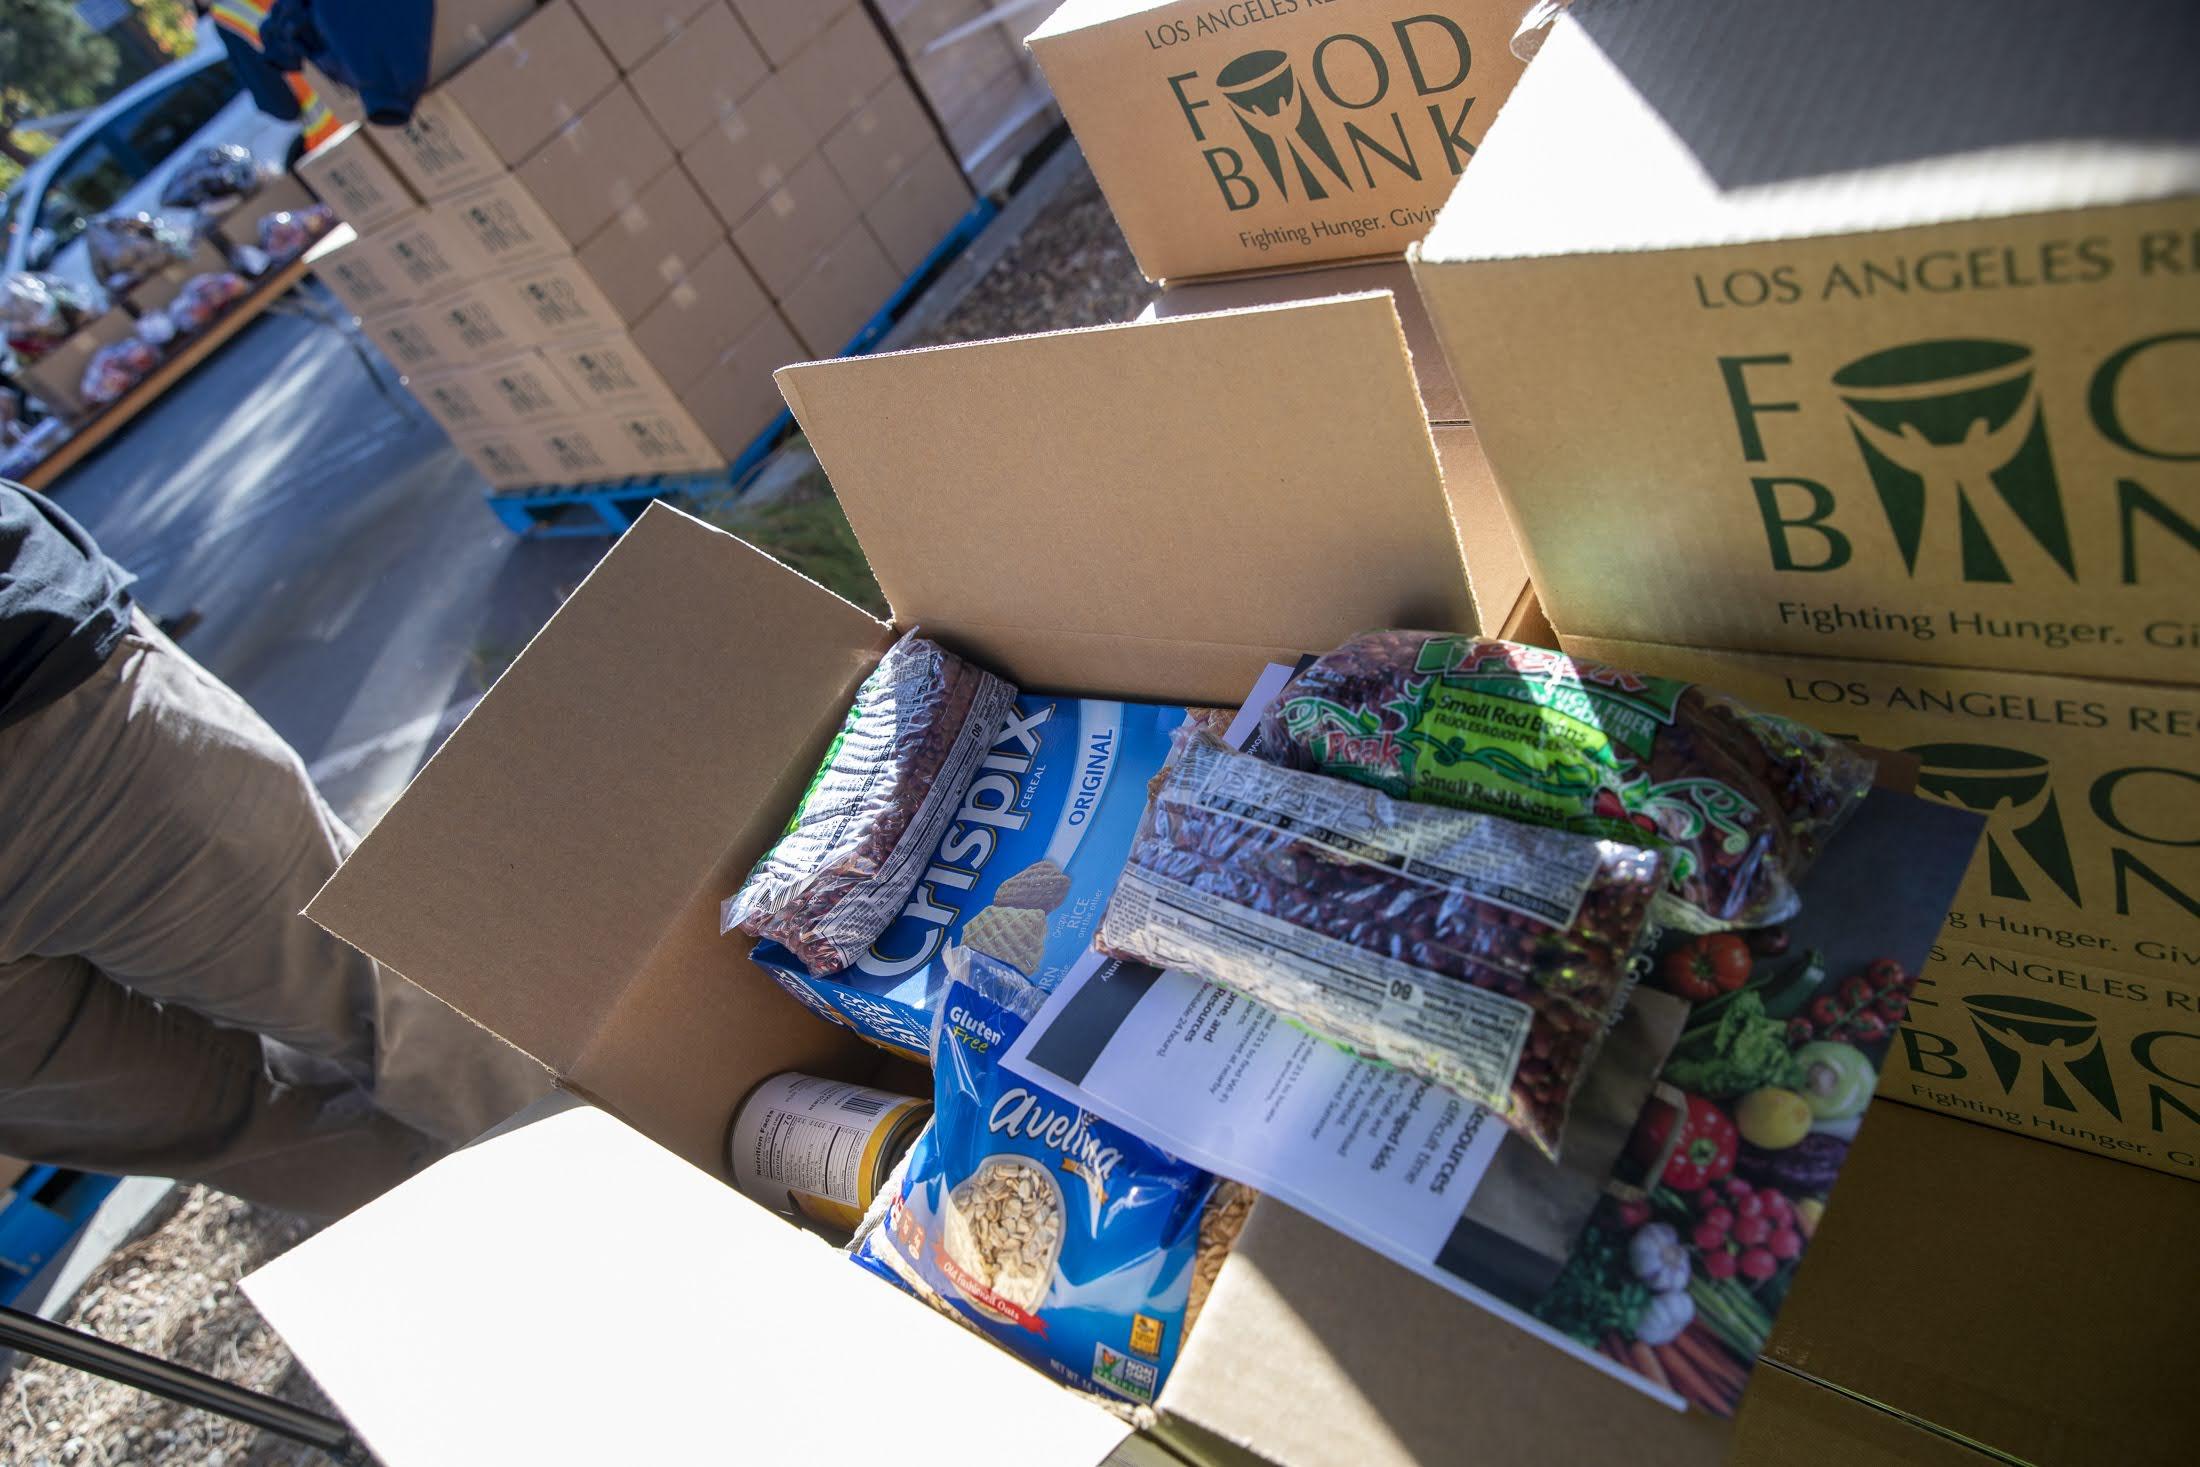 Rosemead High School Free Food Distribution